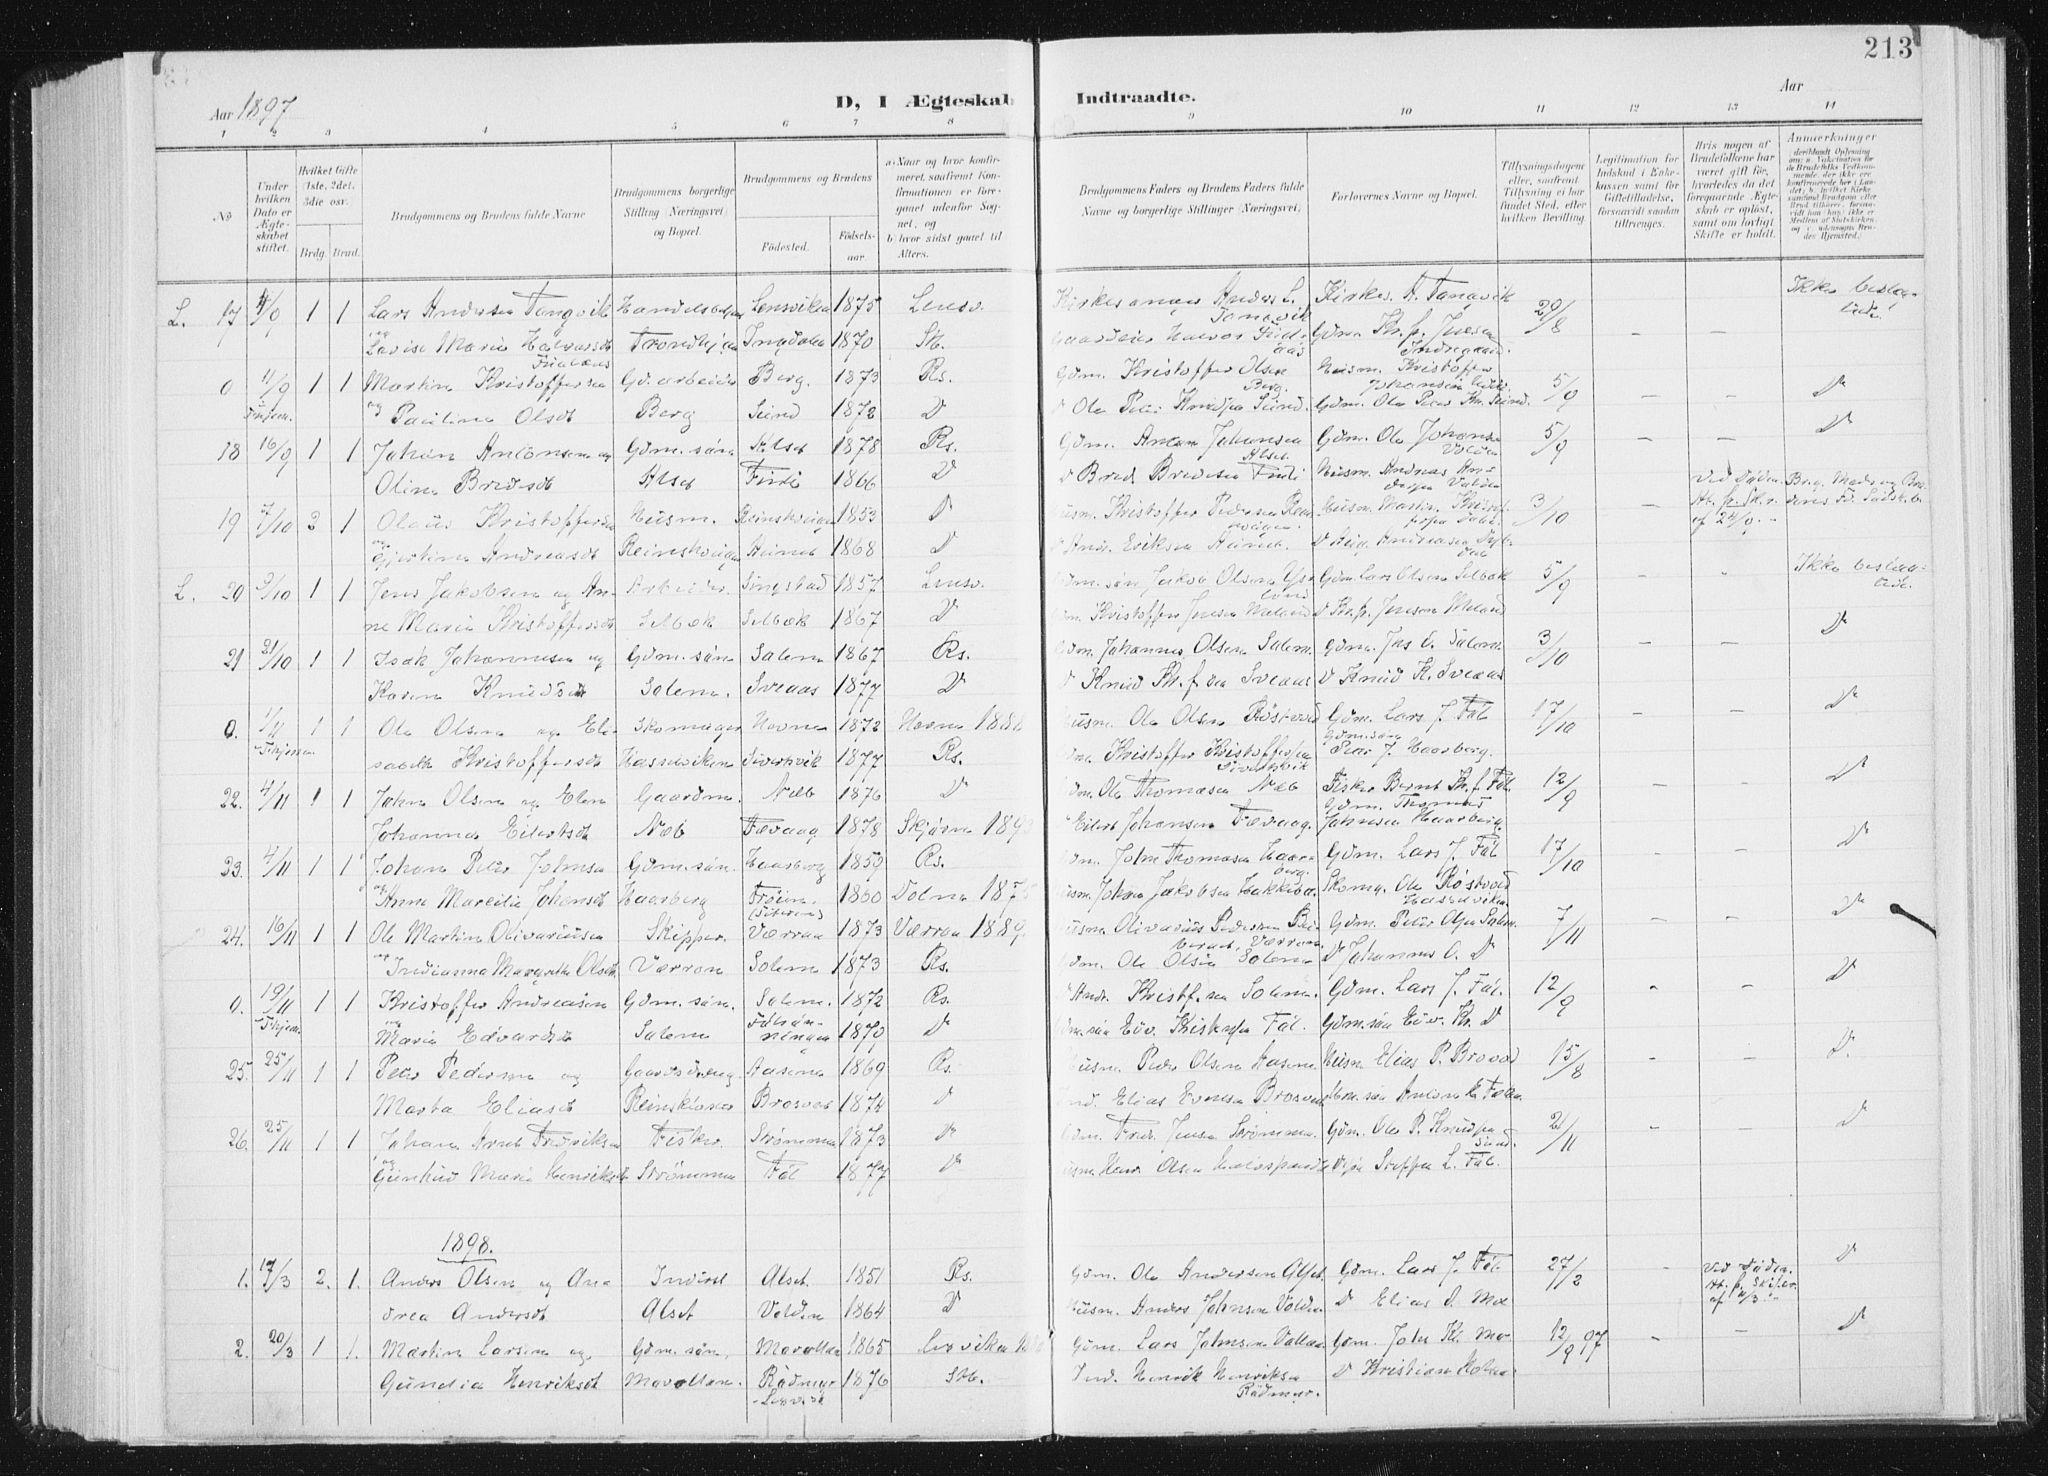 SAT, Ministerialprotokoller, klokkerbøker og fødselsregistre - Sør-Trøndelag, 647/L0635: Parish register (official) no. 647A02, 1896-1911, p. 213